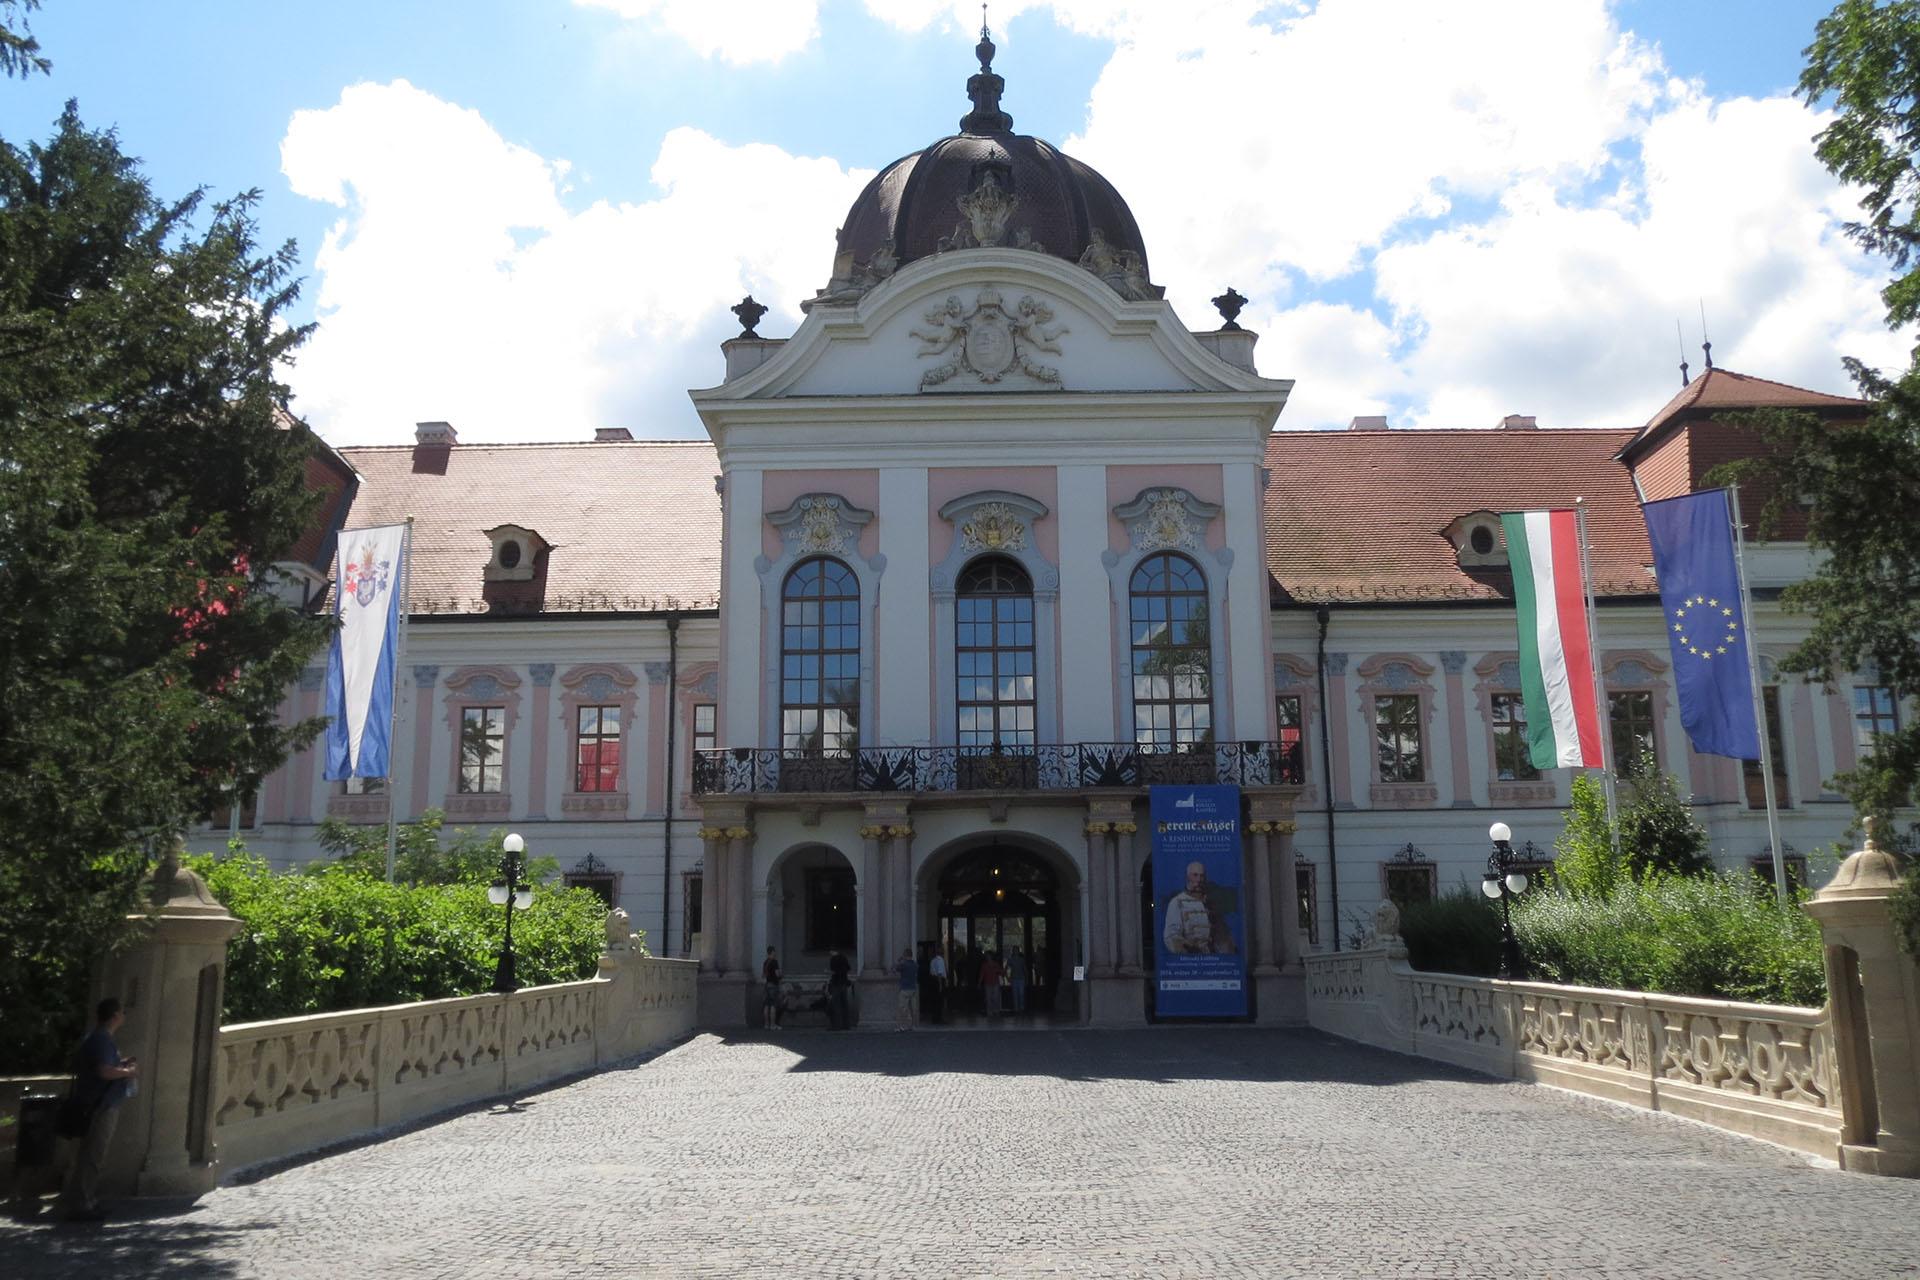 Sissi Castle, Gödöllő